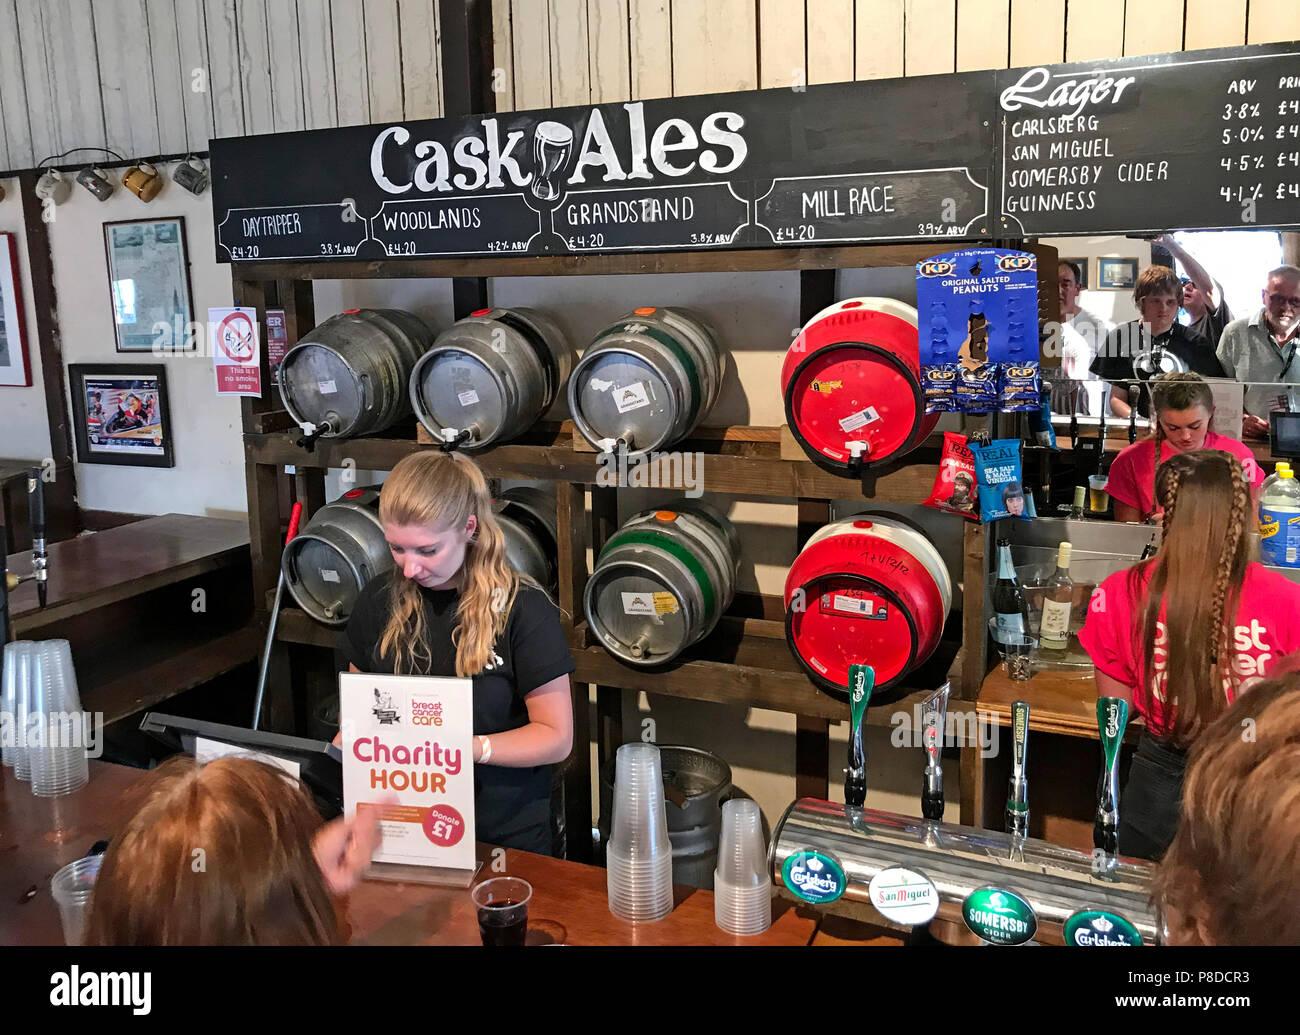 @HotpixUK,GoTonySmith,Silverstone,racing circuit,F1,GP,Formula One,Grand Prix,GrandPrix,Silverstone Woodlands,2018,cask,ale,ales,CAMRA,Cask Ales,beer,real ale,Northampton,England,UK,Ales,Pub,bar,barrels,Towcester Mill cask beer,cask ale,Silverstone pub,Silverstone bar